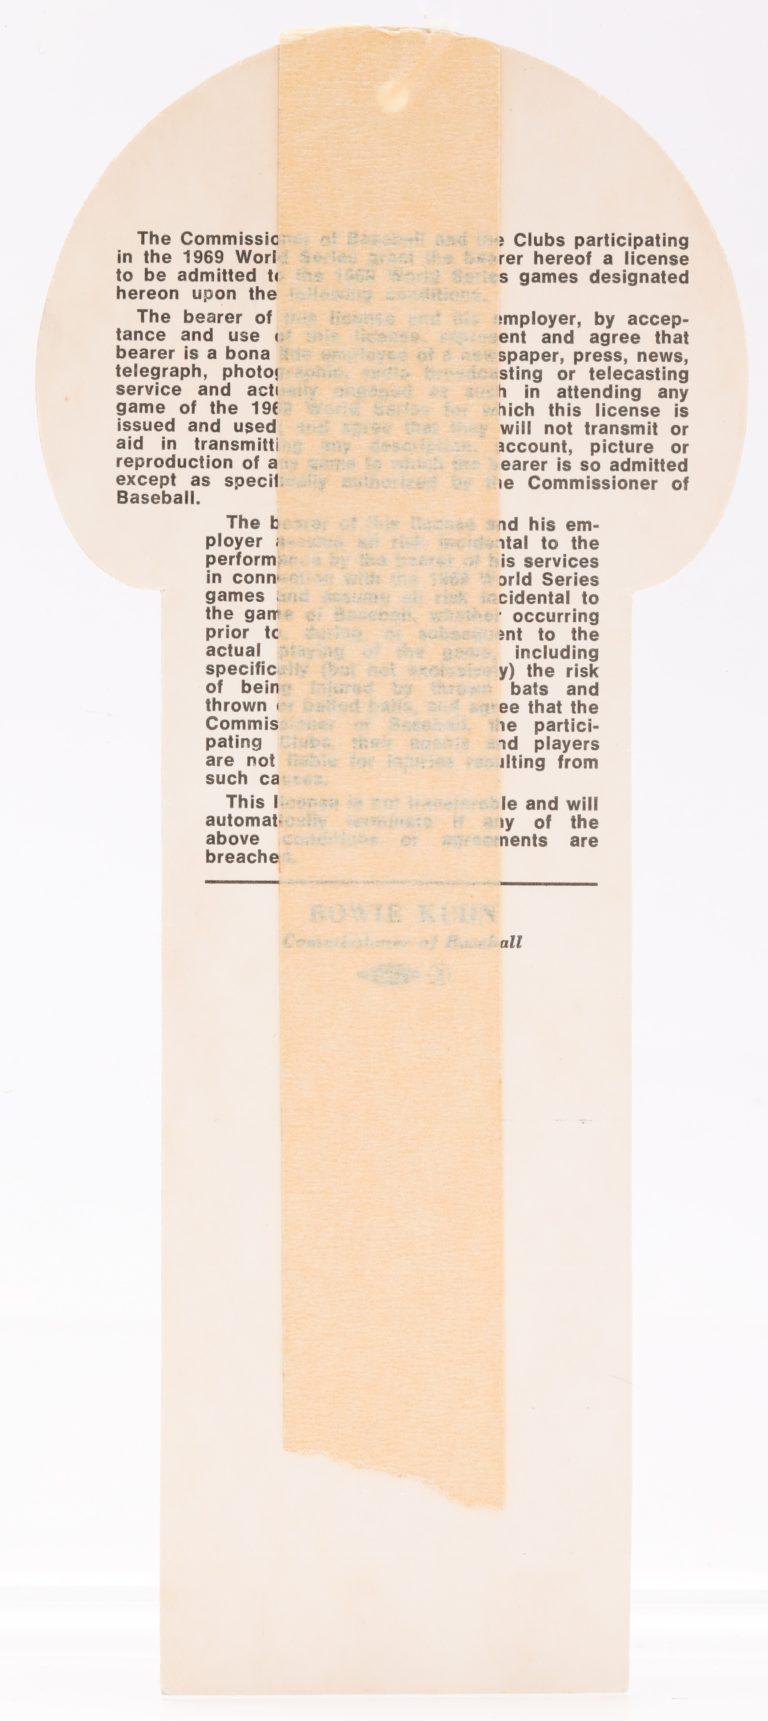 1969 World Series Press Pass - Back